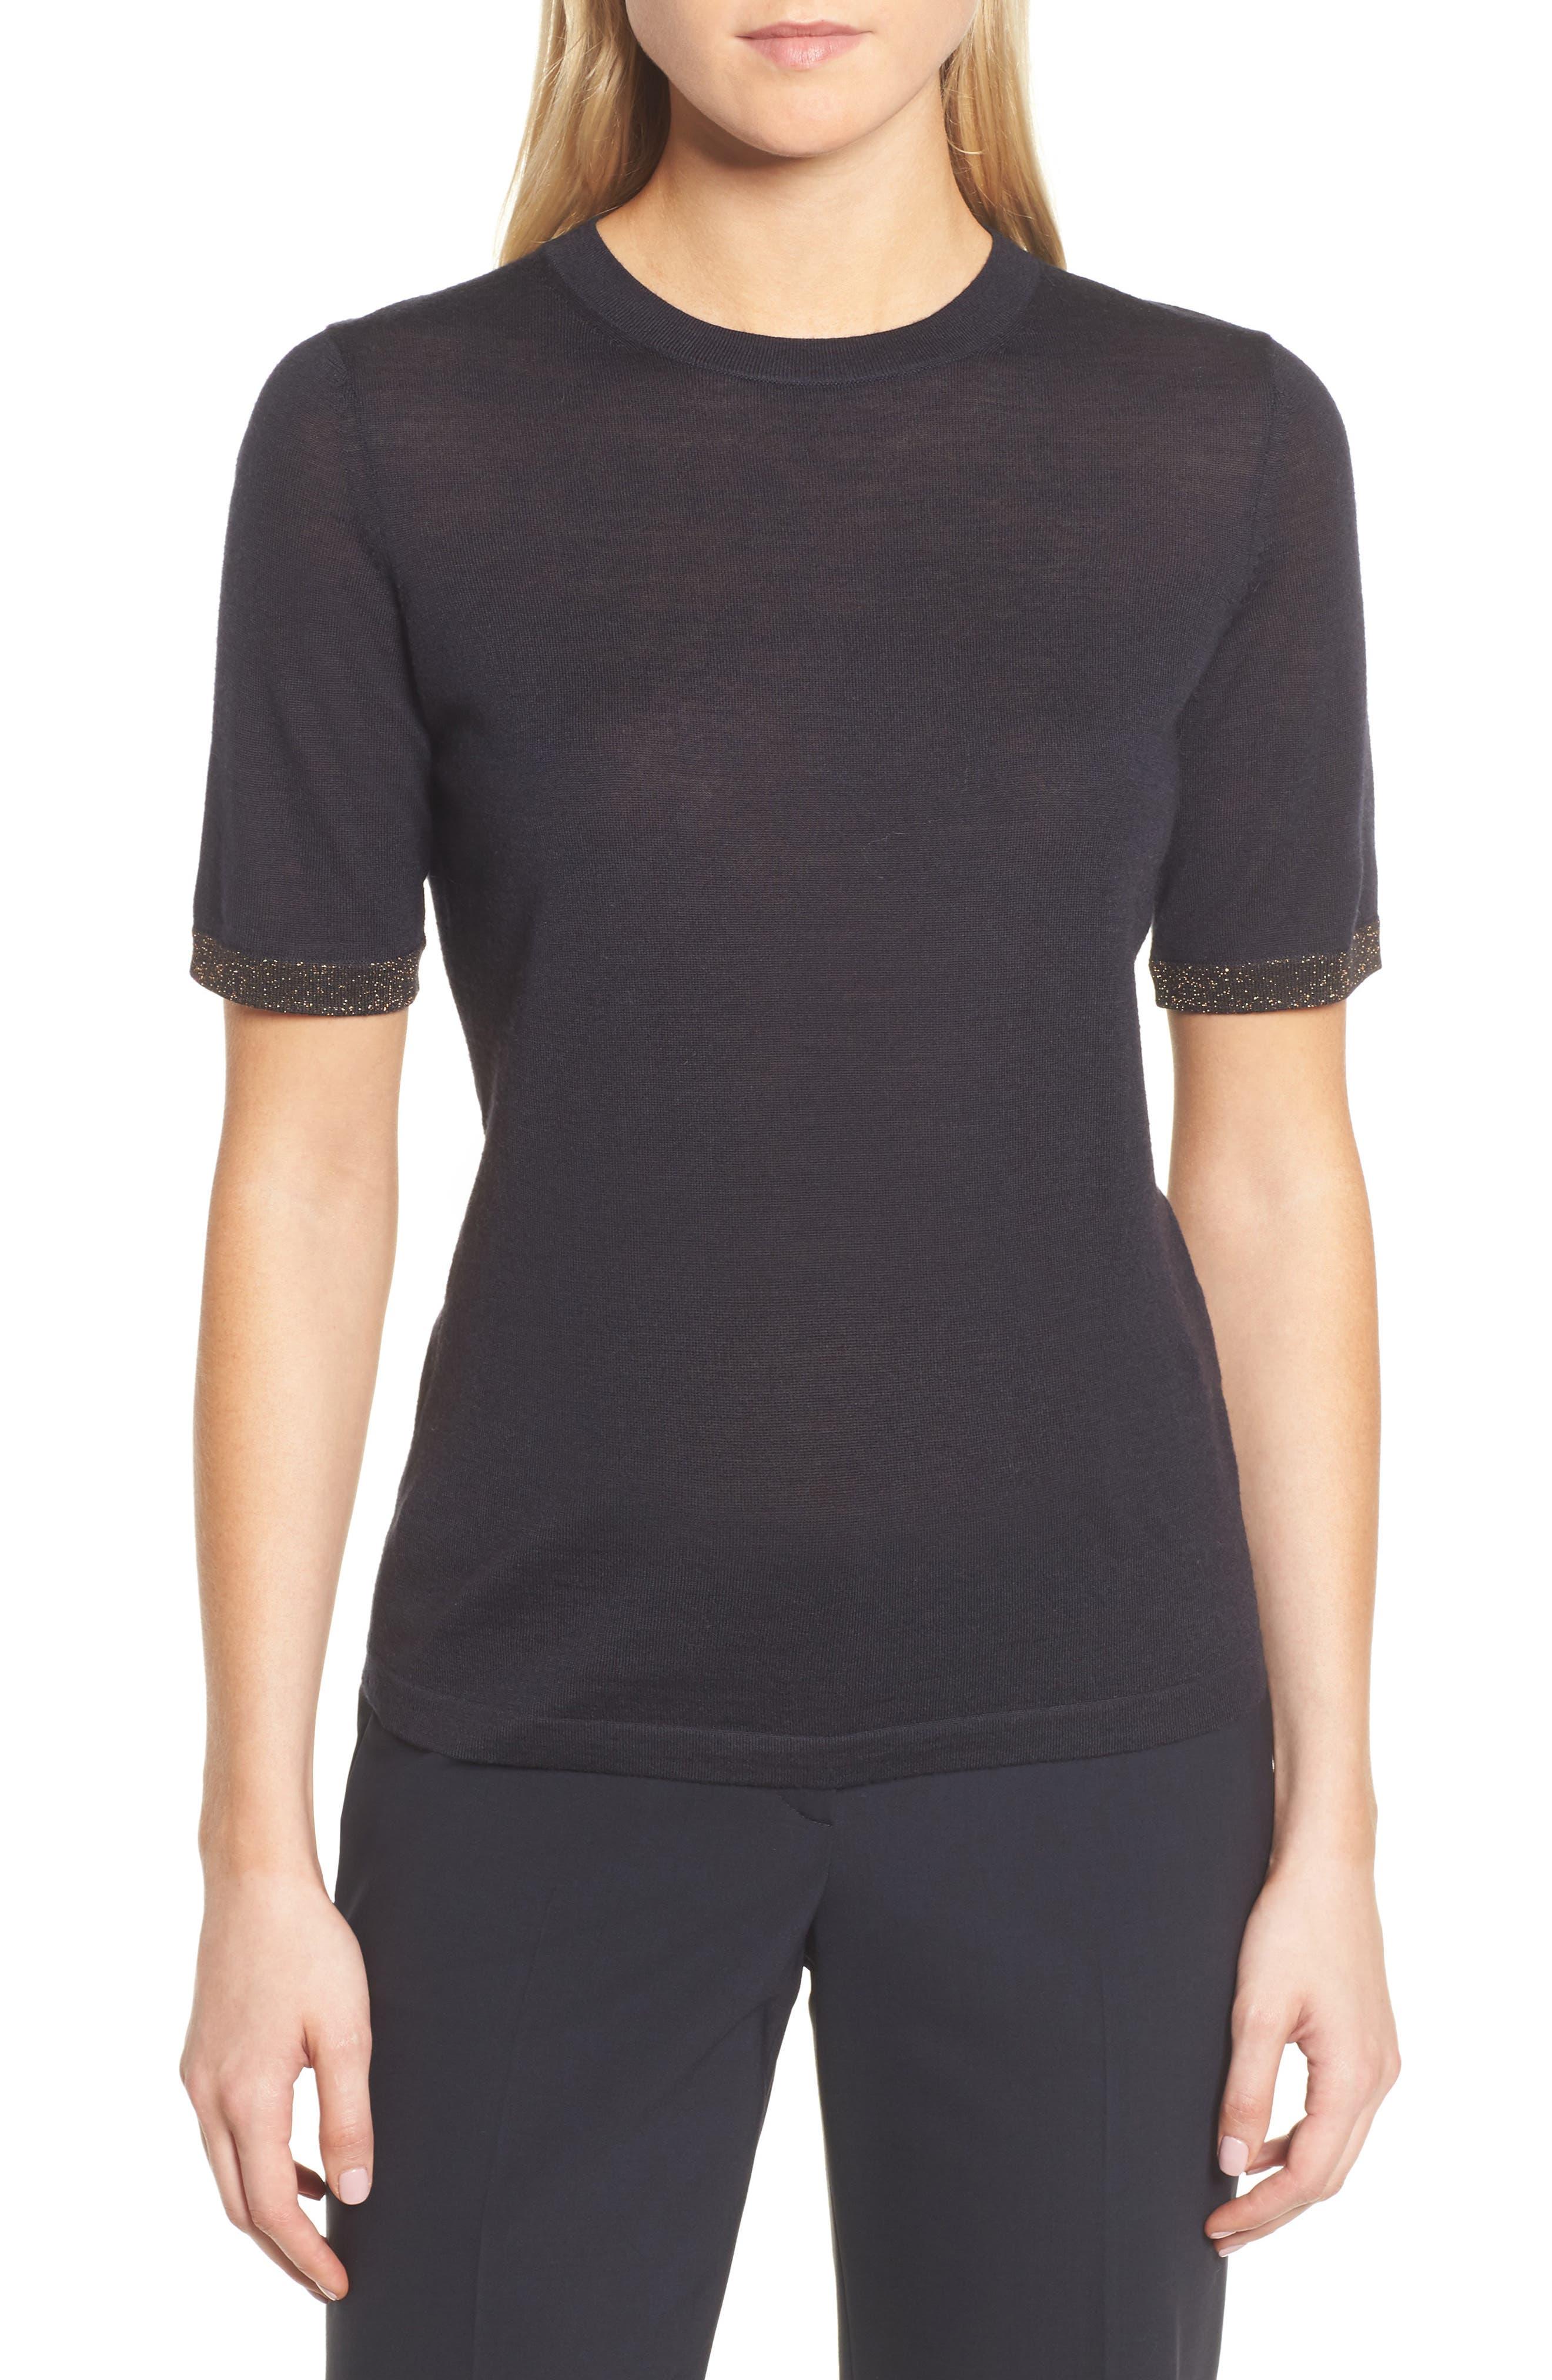 Main Image - BOSS Fifet Sparkle Trim Sweater